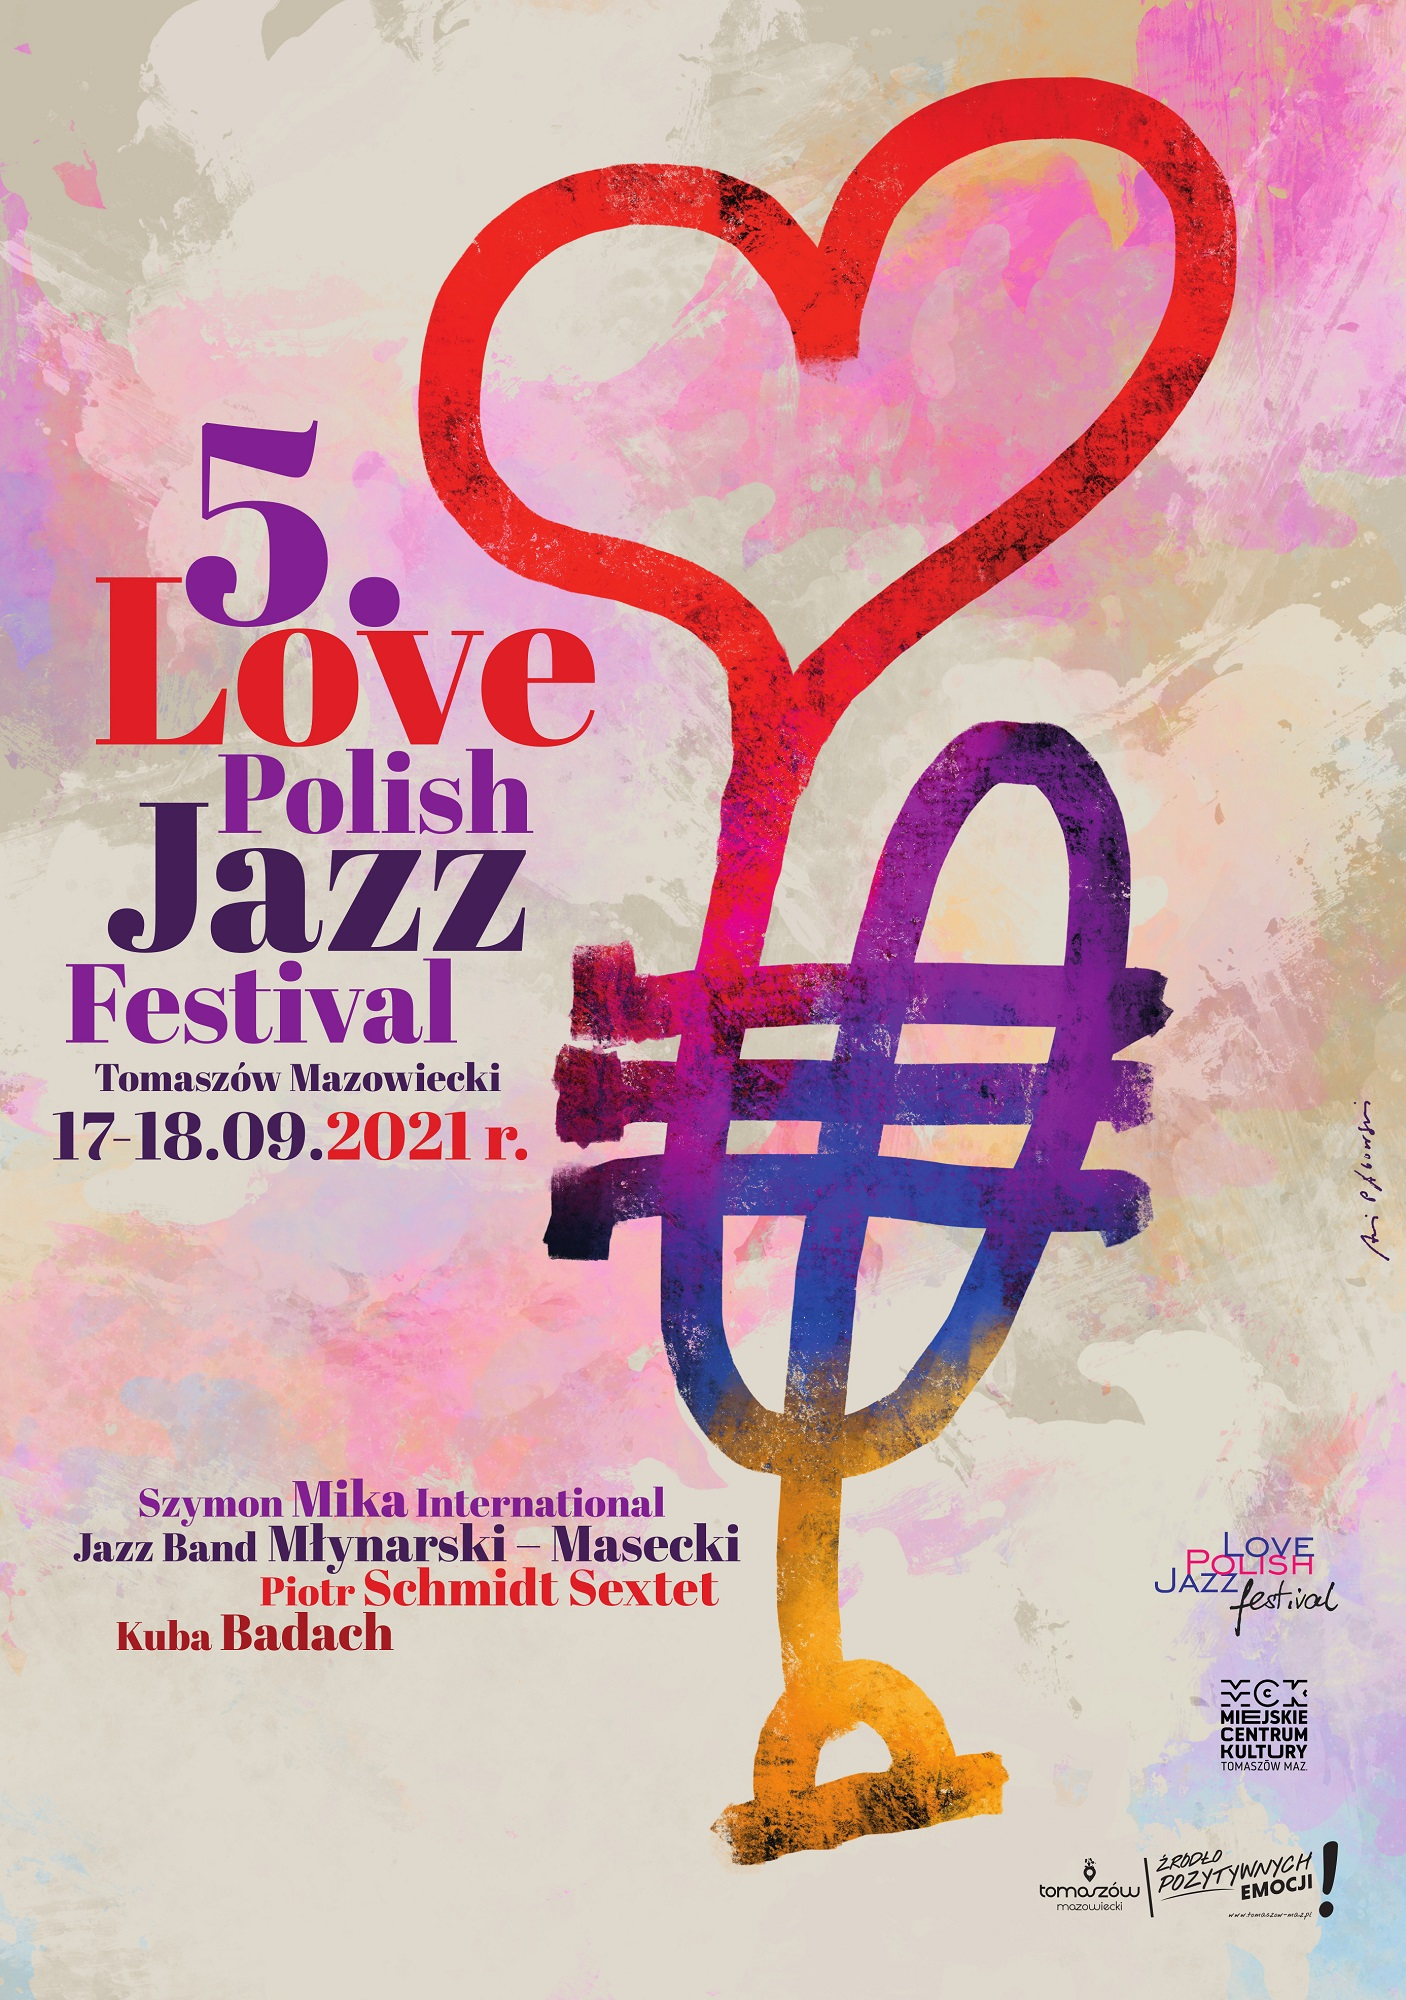 5. Love Polish Jazz Festival